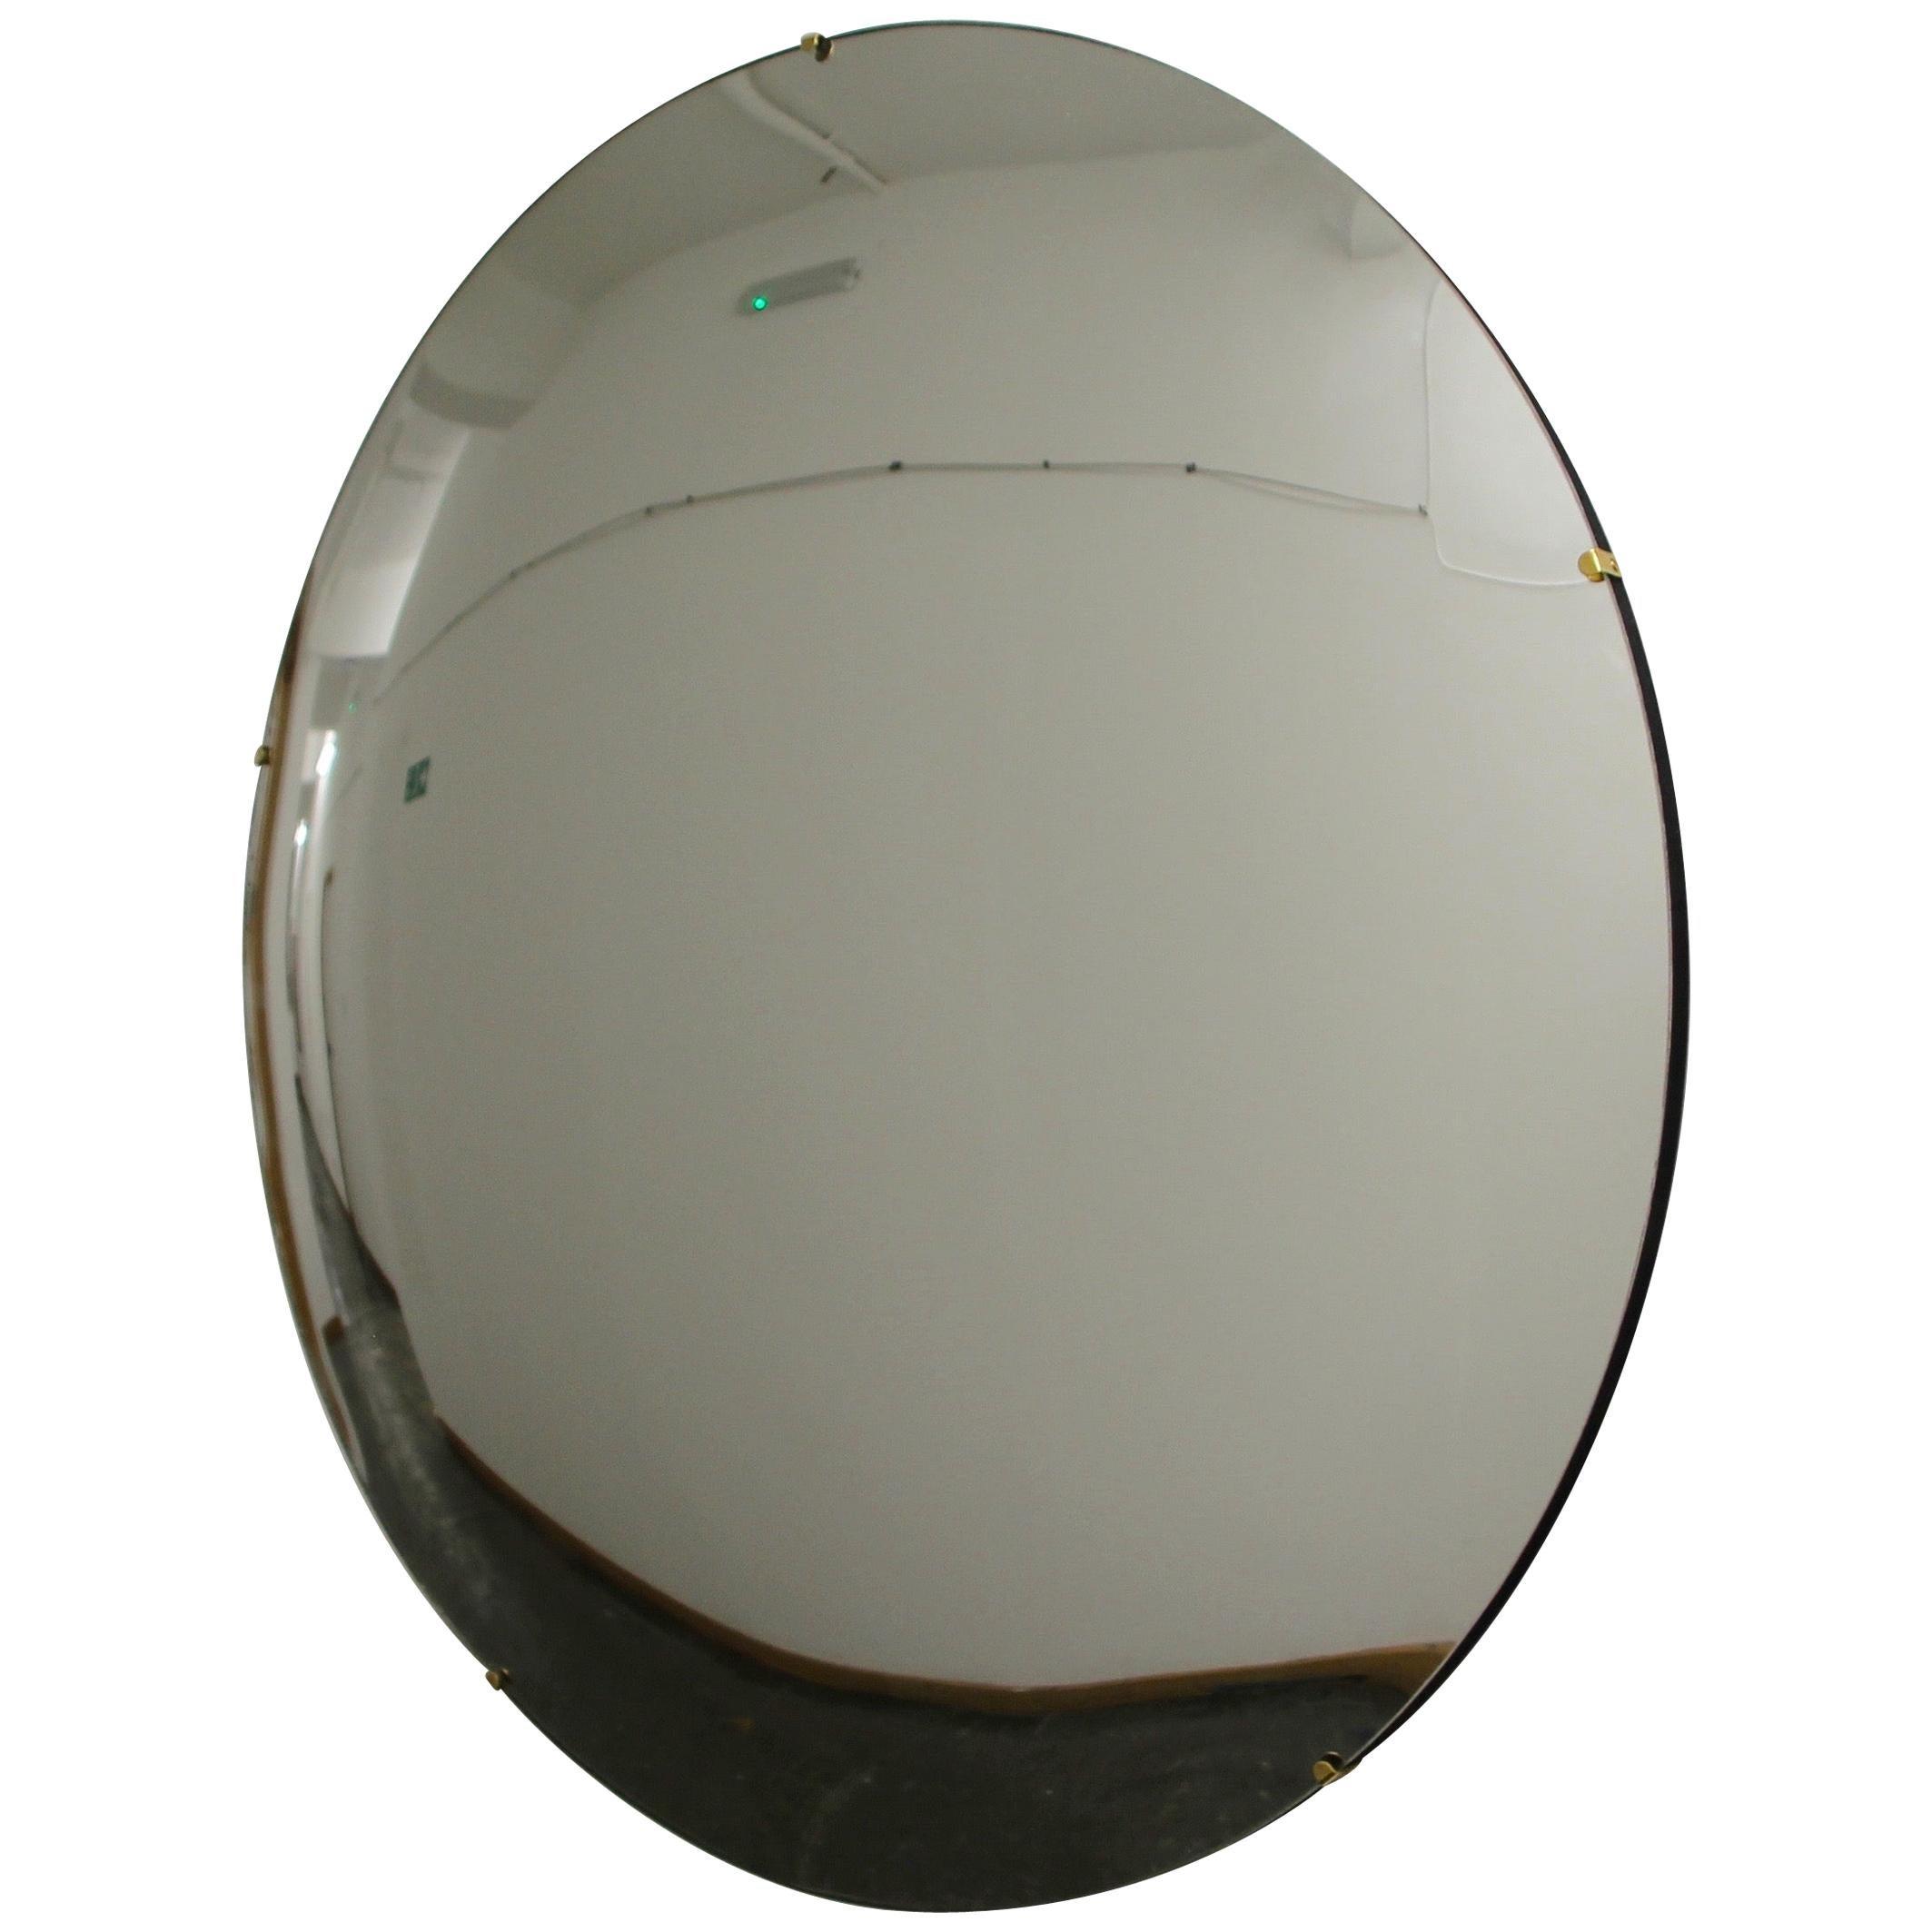 Orbis™ Round Convex Modern Handcrafted Frameless Mirror - Large